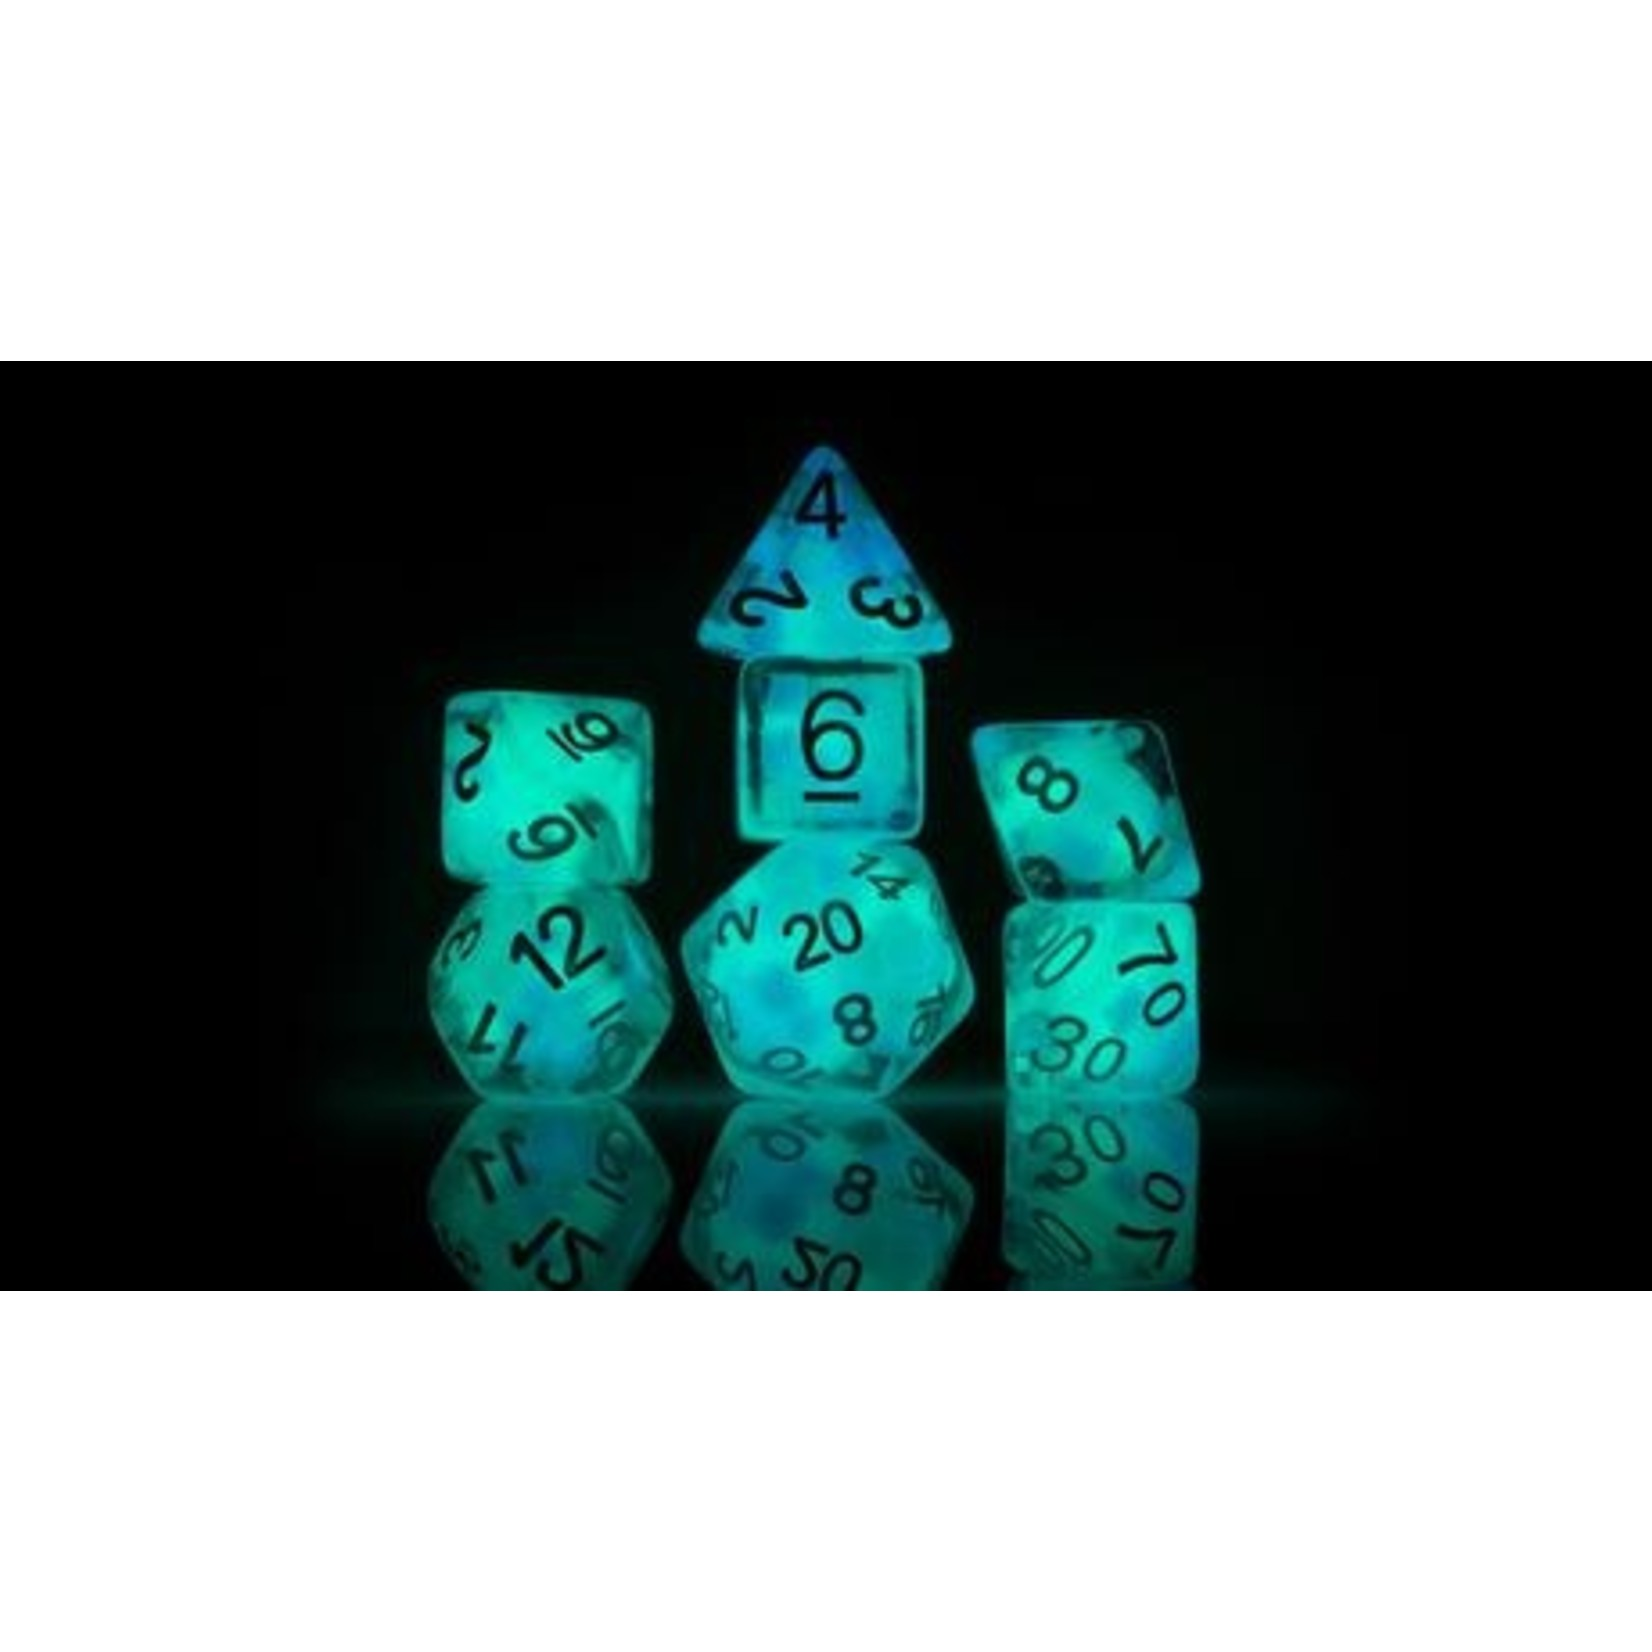 Cotton Candy Glowworm RPG Dice Set (7)